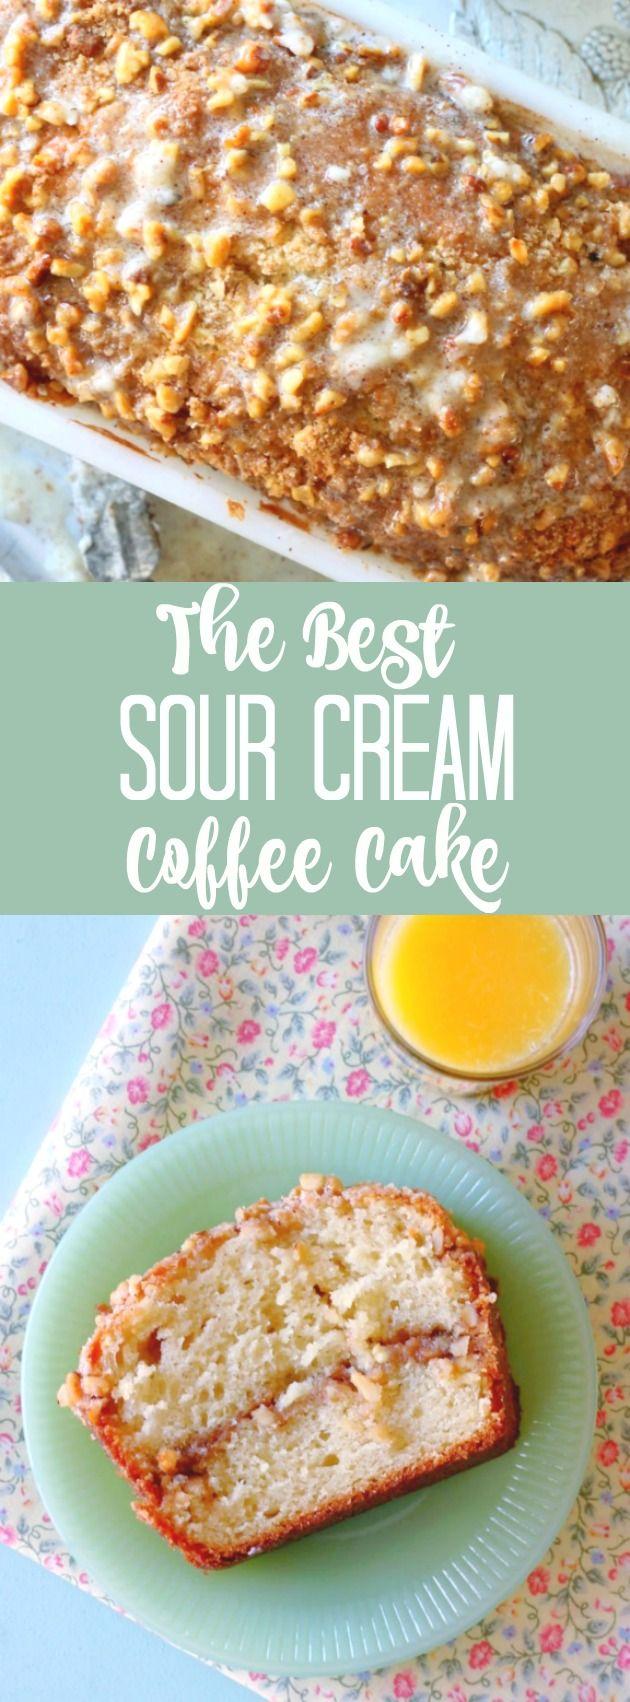 The Best Sour Cream Coffee Cake